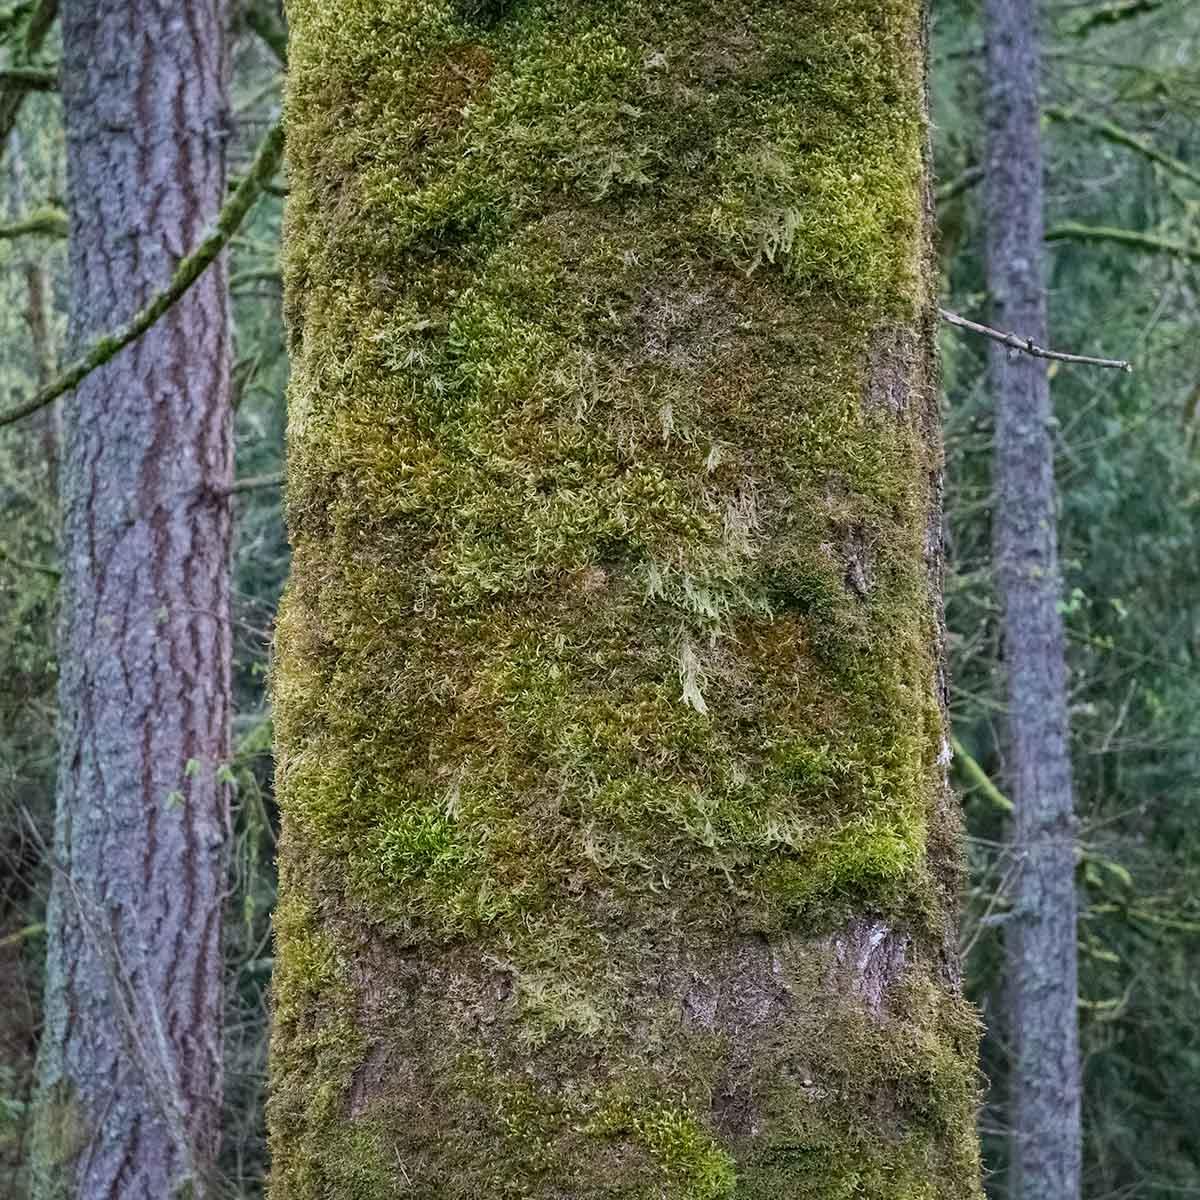 Bigleaf maple trunk